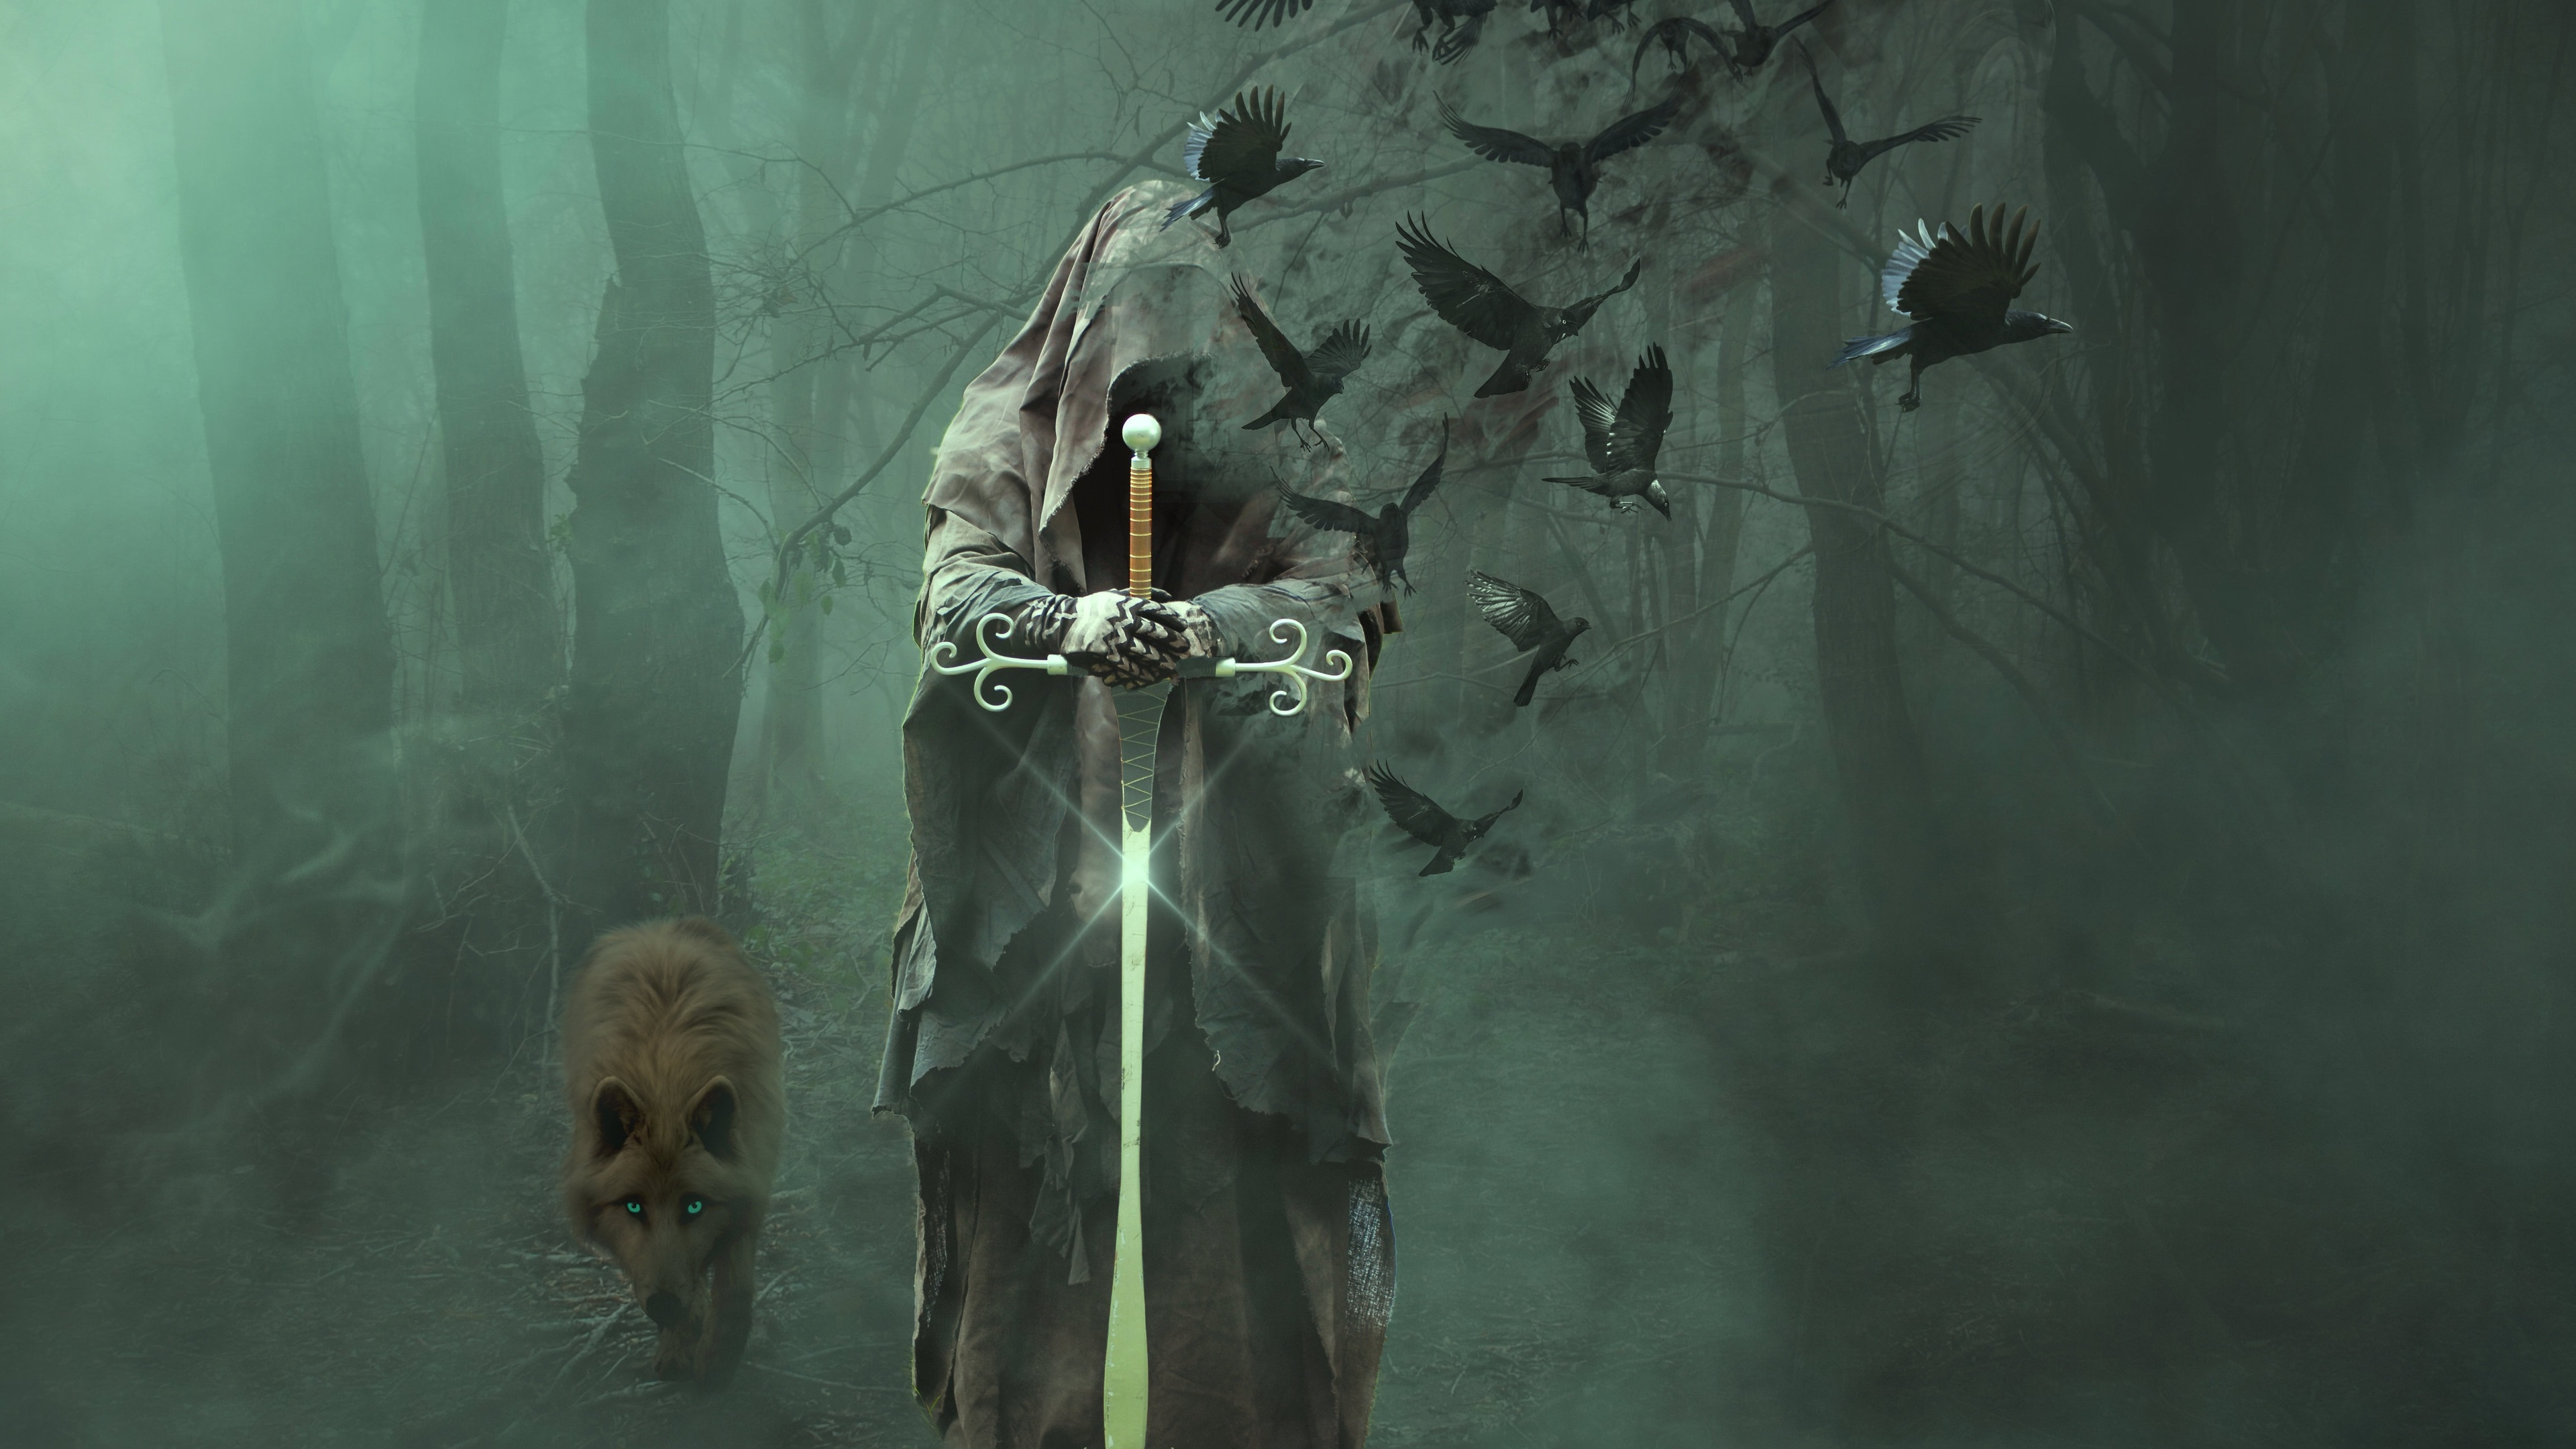 wizard of death in a dark forest 1540751168 - Wizard Of Death In A Dark Forest - hd-wallpapers, digital art wallpapers, artwork wallpapers, artist wallpapers, 4k-wallpapers